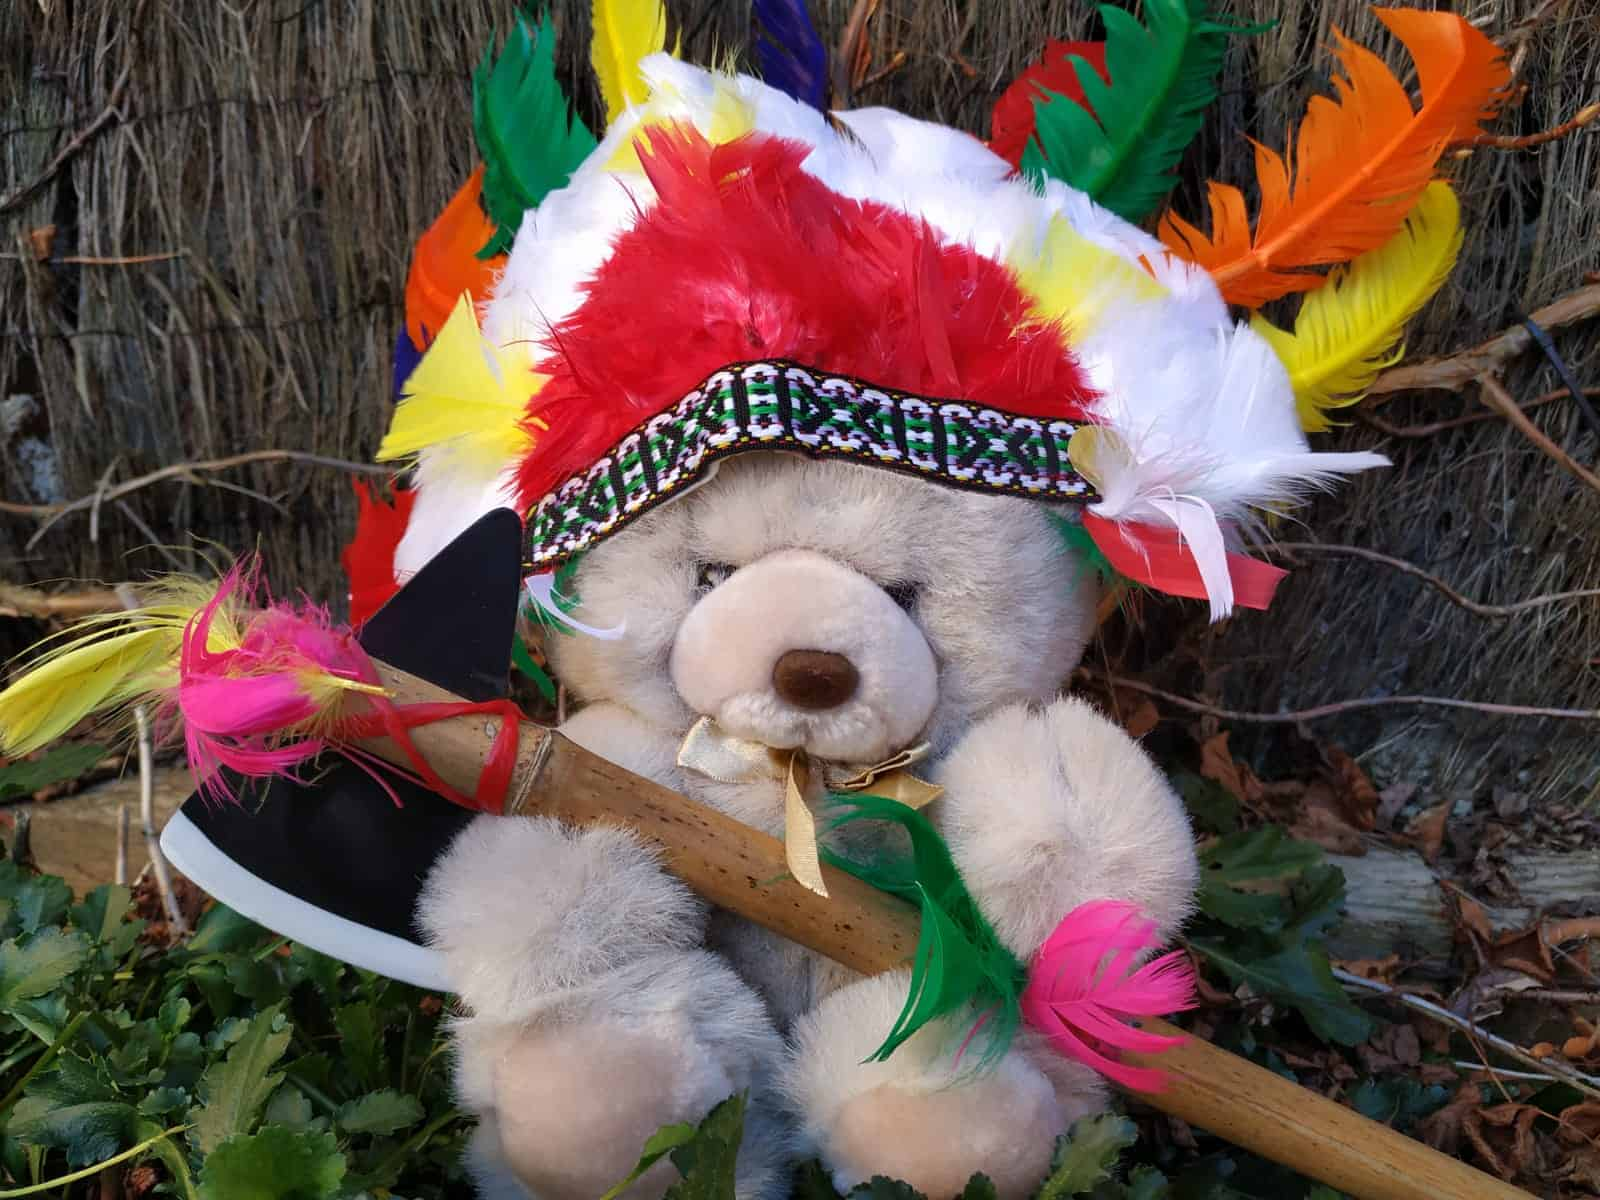 ¡Llegó el finde de Carnaval!